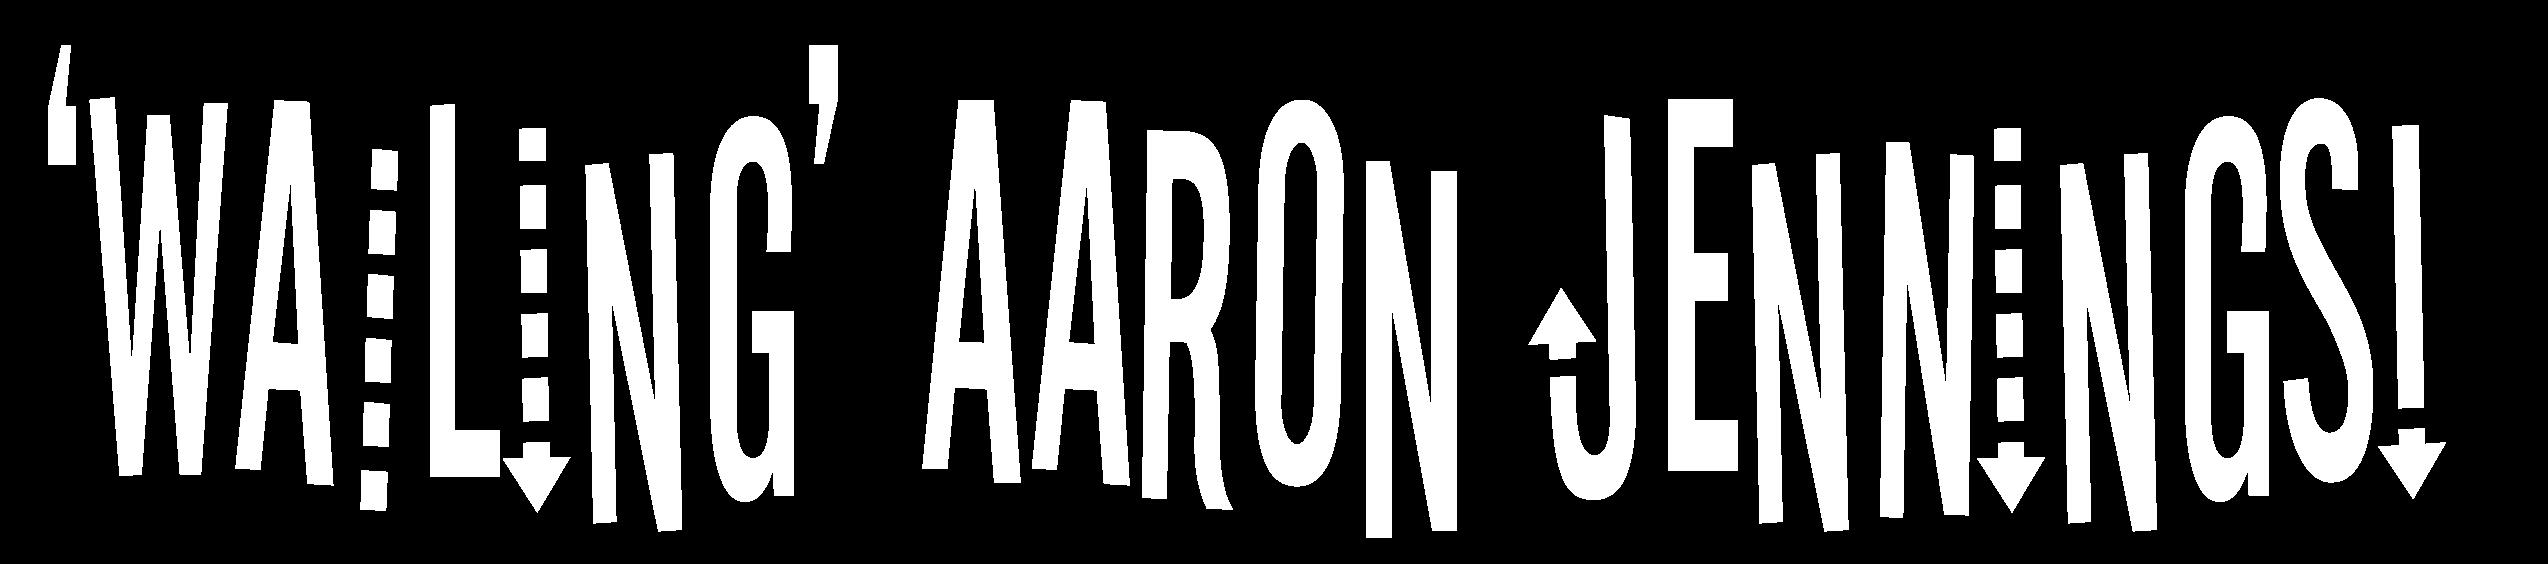 Wailing Aaron Jennings